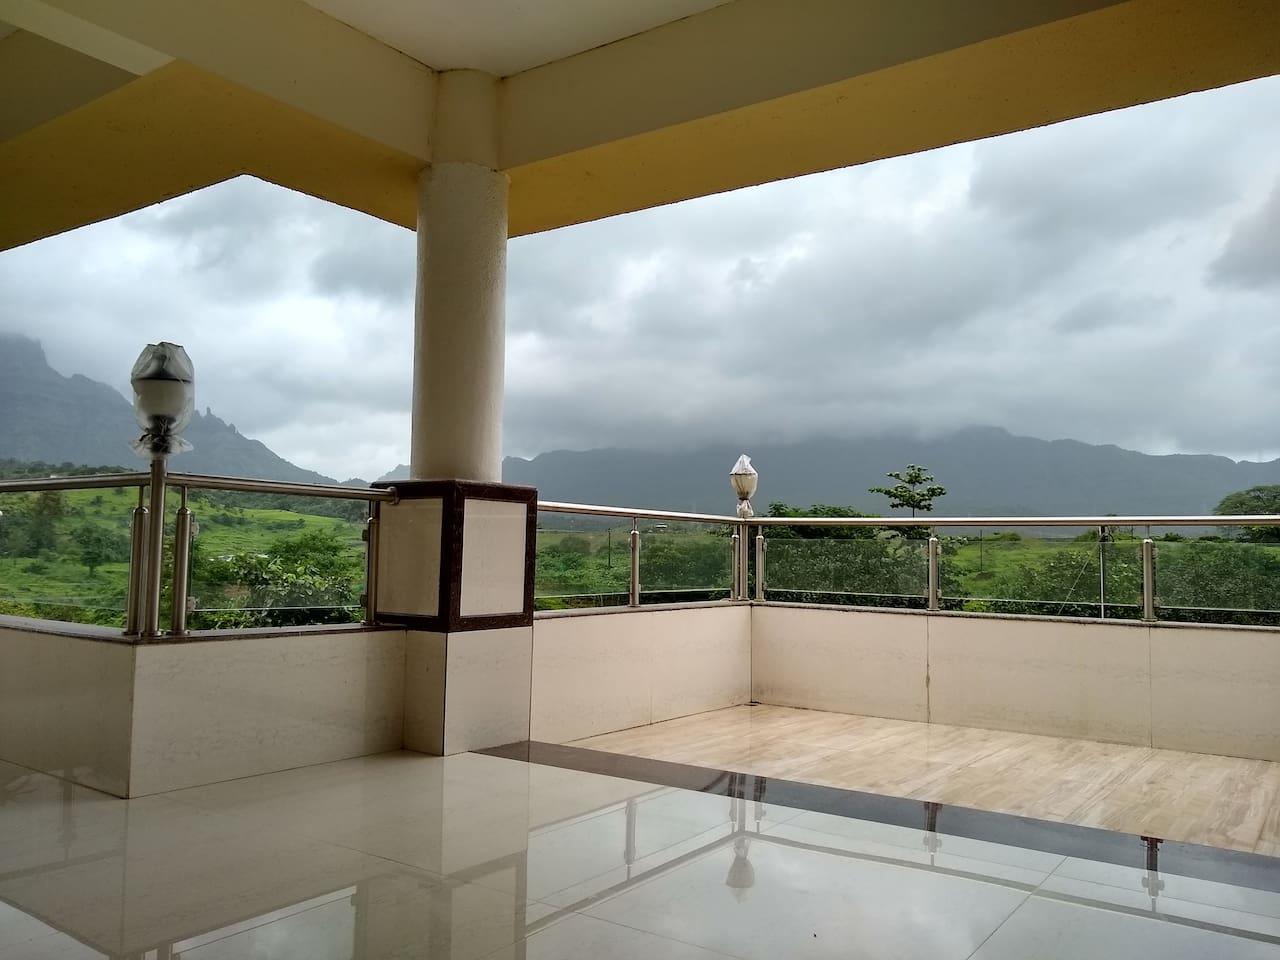 Gallery of the Villa